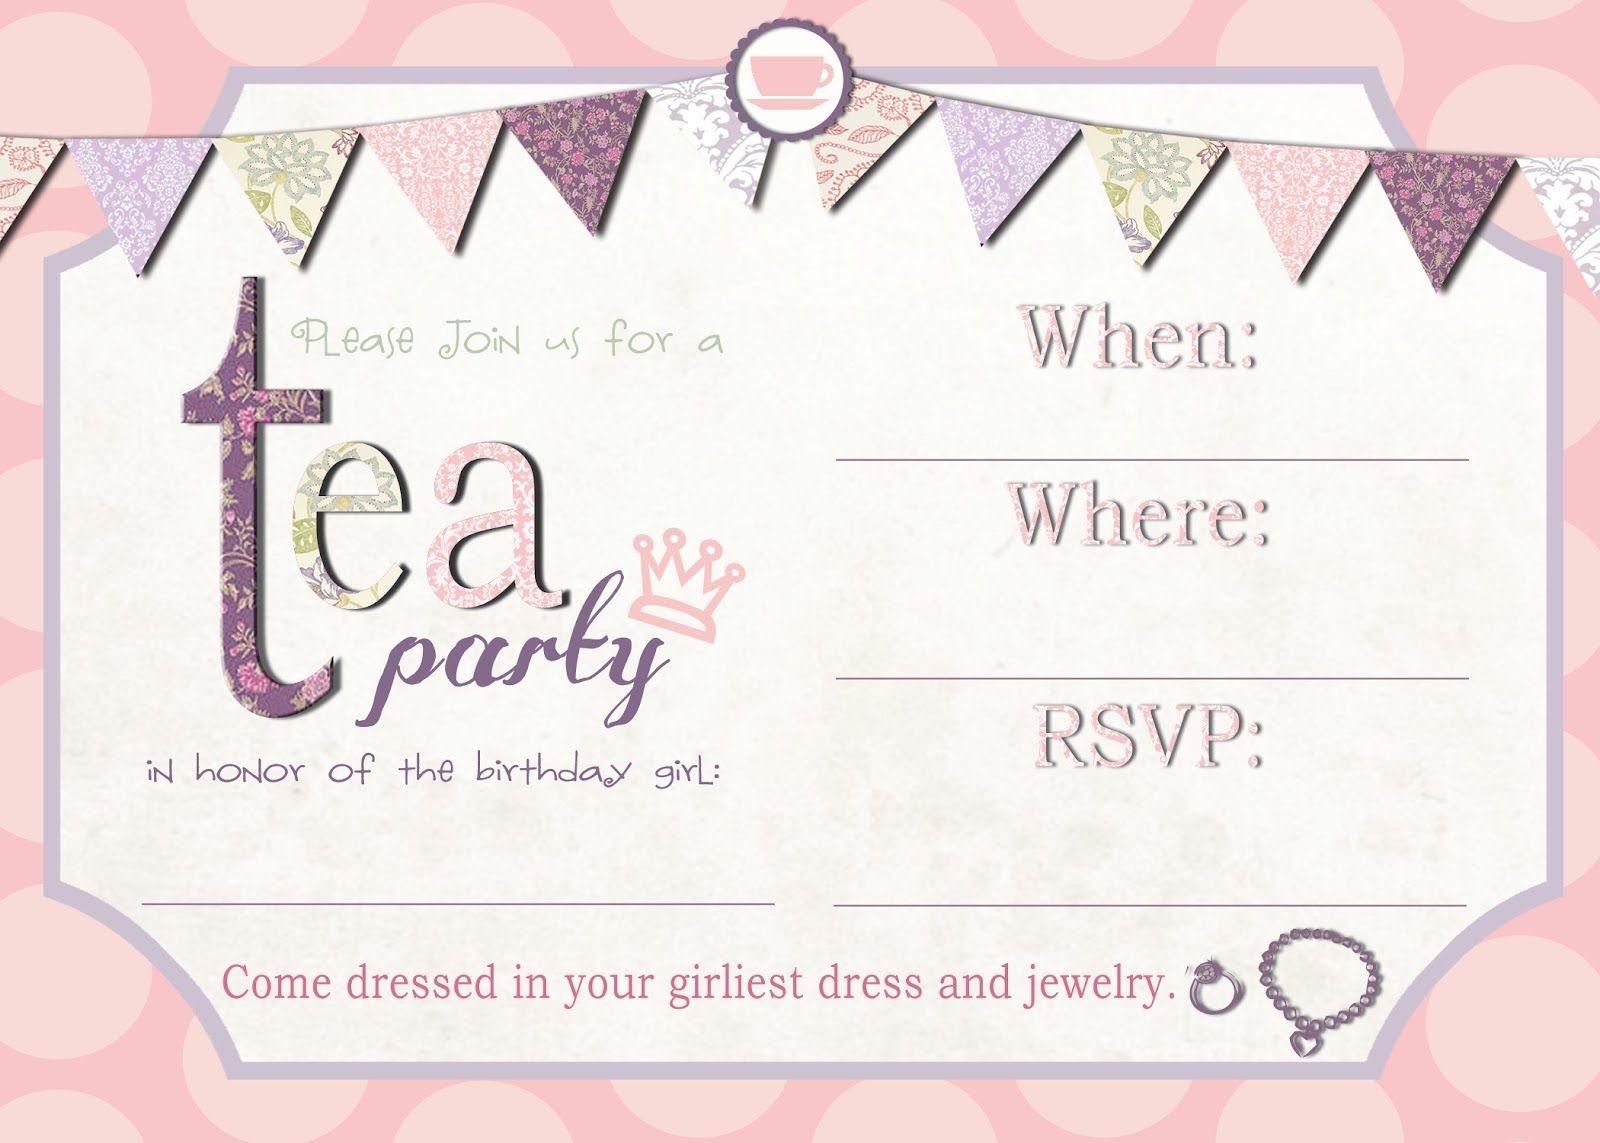 Tea Party Invitation Template Download – Invitetown | Girls' Tea - Free Printable Vintage Tea Party Invitations